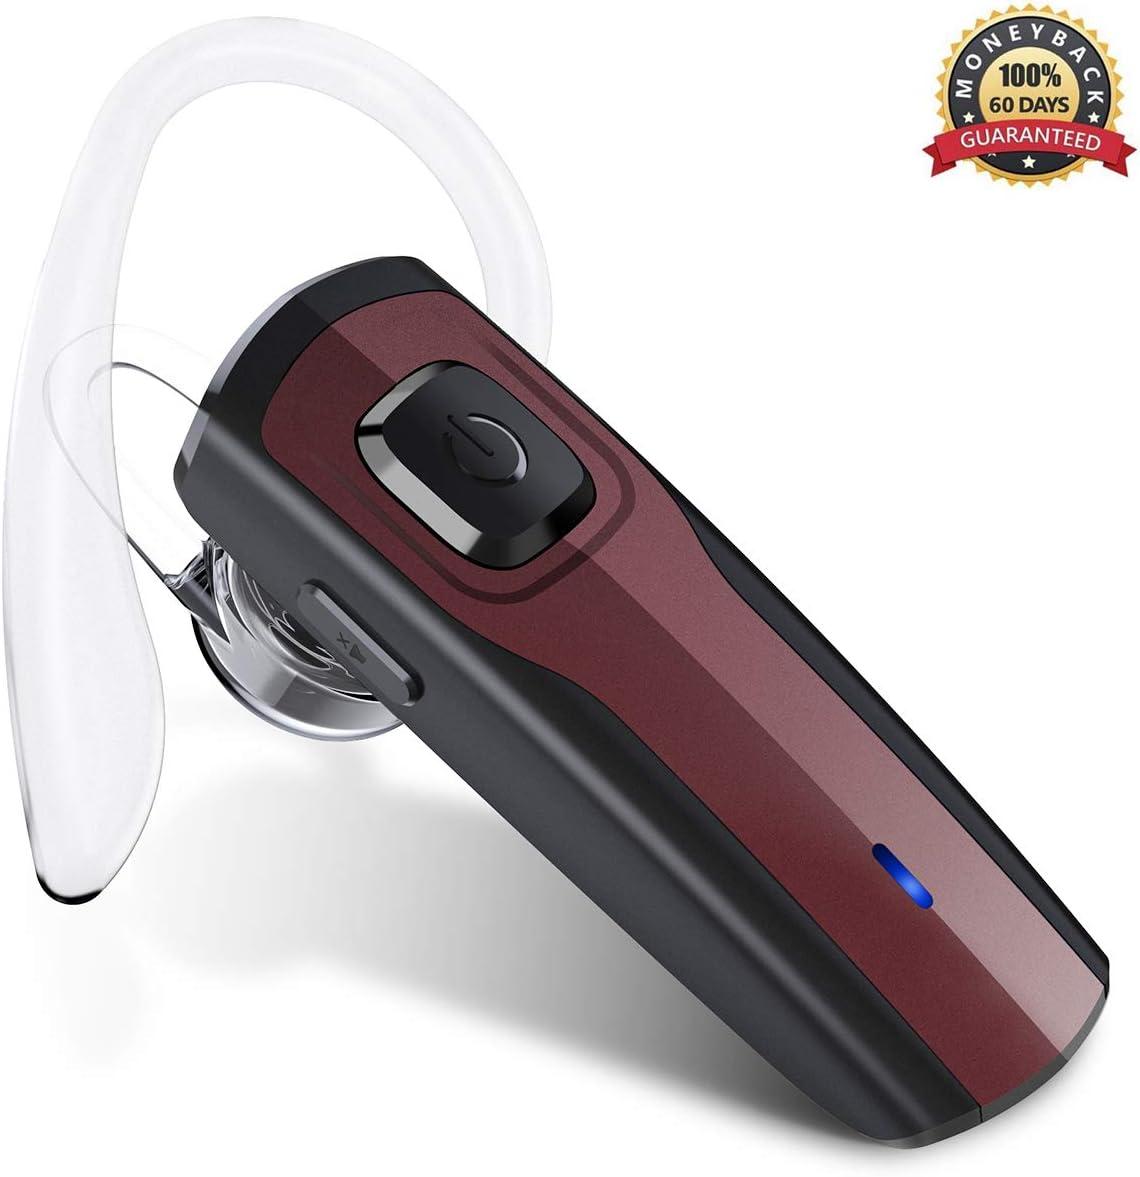 Auriculares Inalámbricos Auricular Bluetooth Telefono Manos Libres Bluetooth Headset con Micrófono para Negocios/ Trukers/ Conductor con Android iPhone